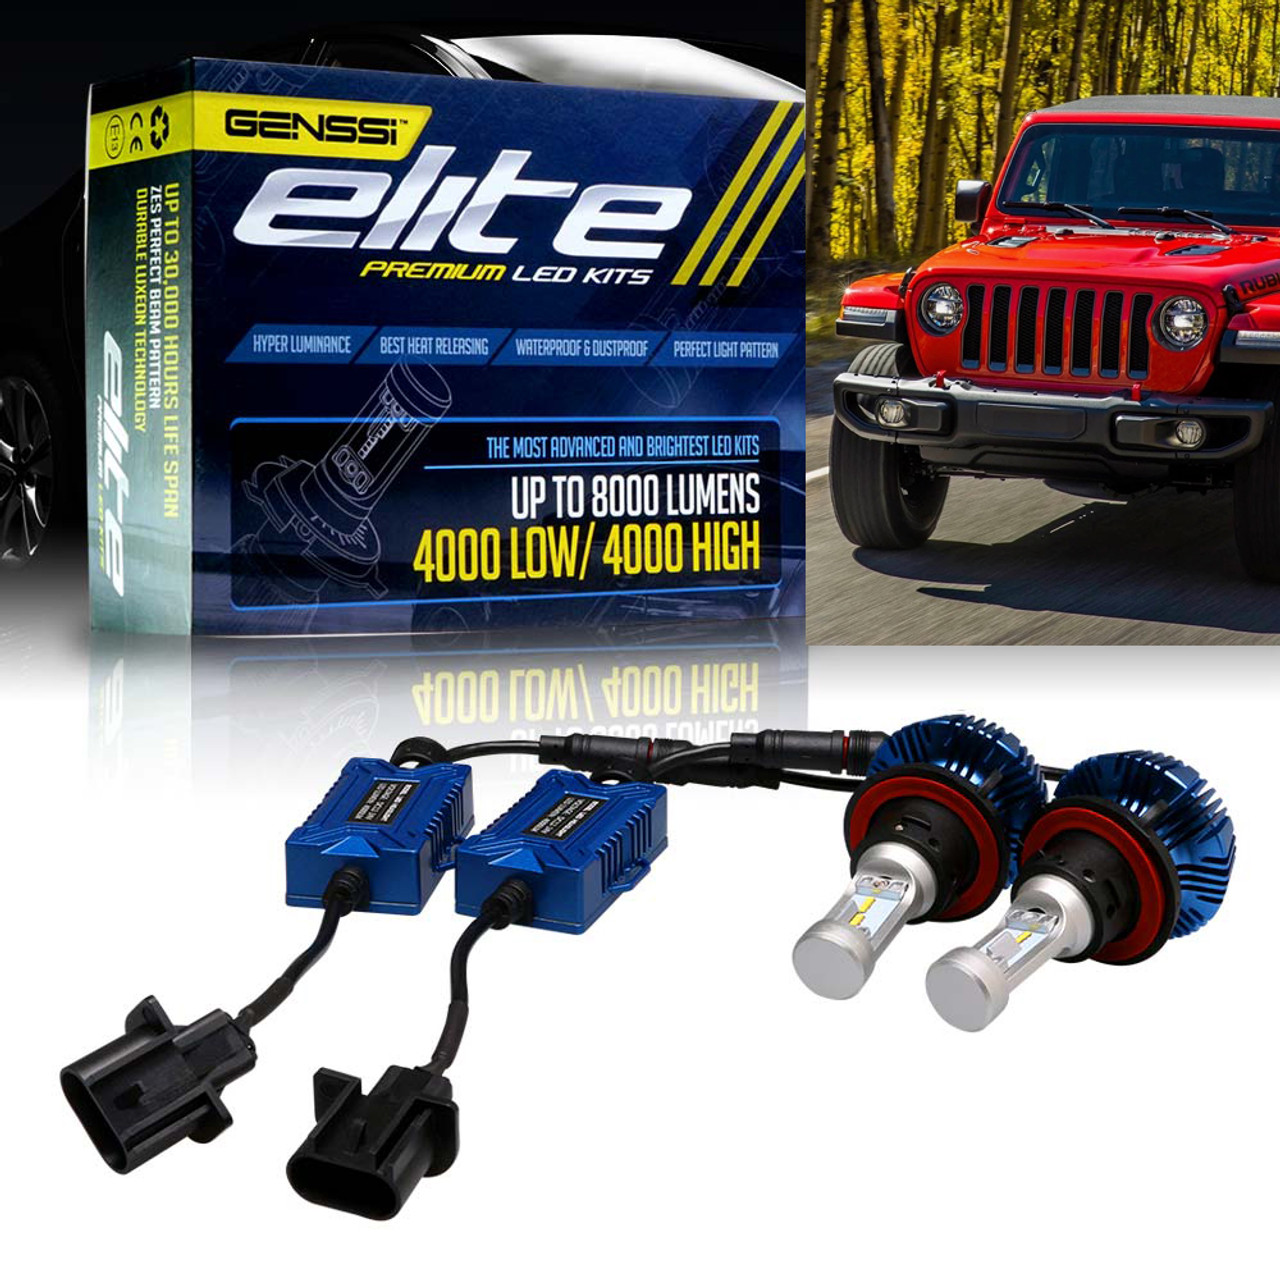 Led Headlight Conversion Kit For Jeep Wrangler Jl 2018 Up